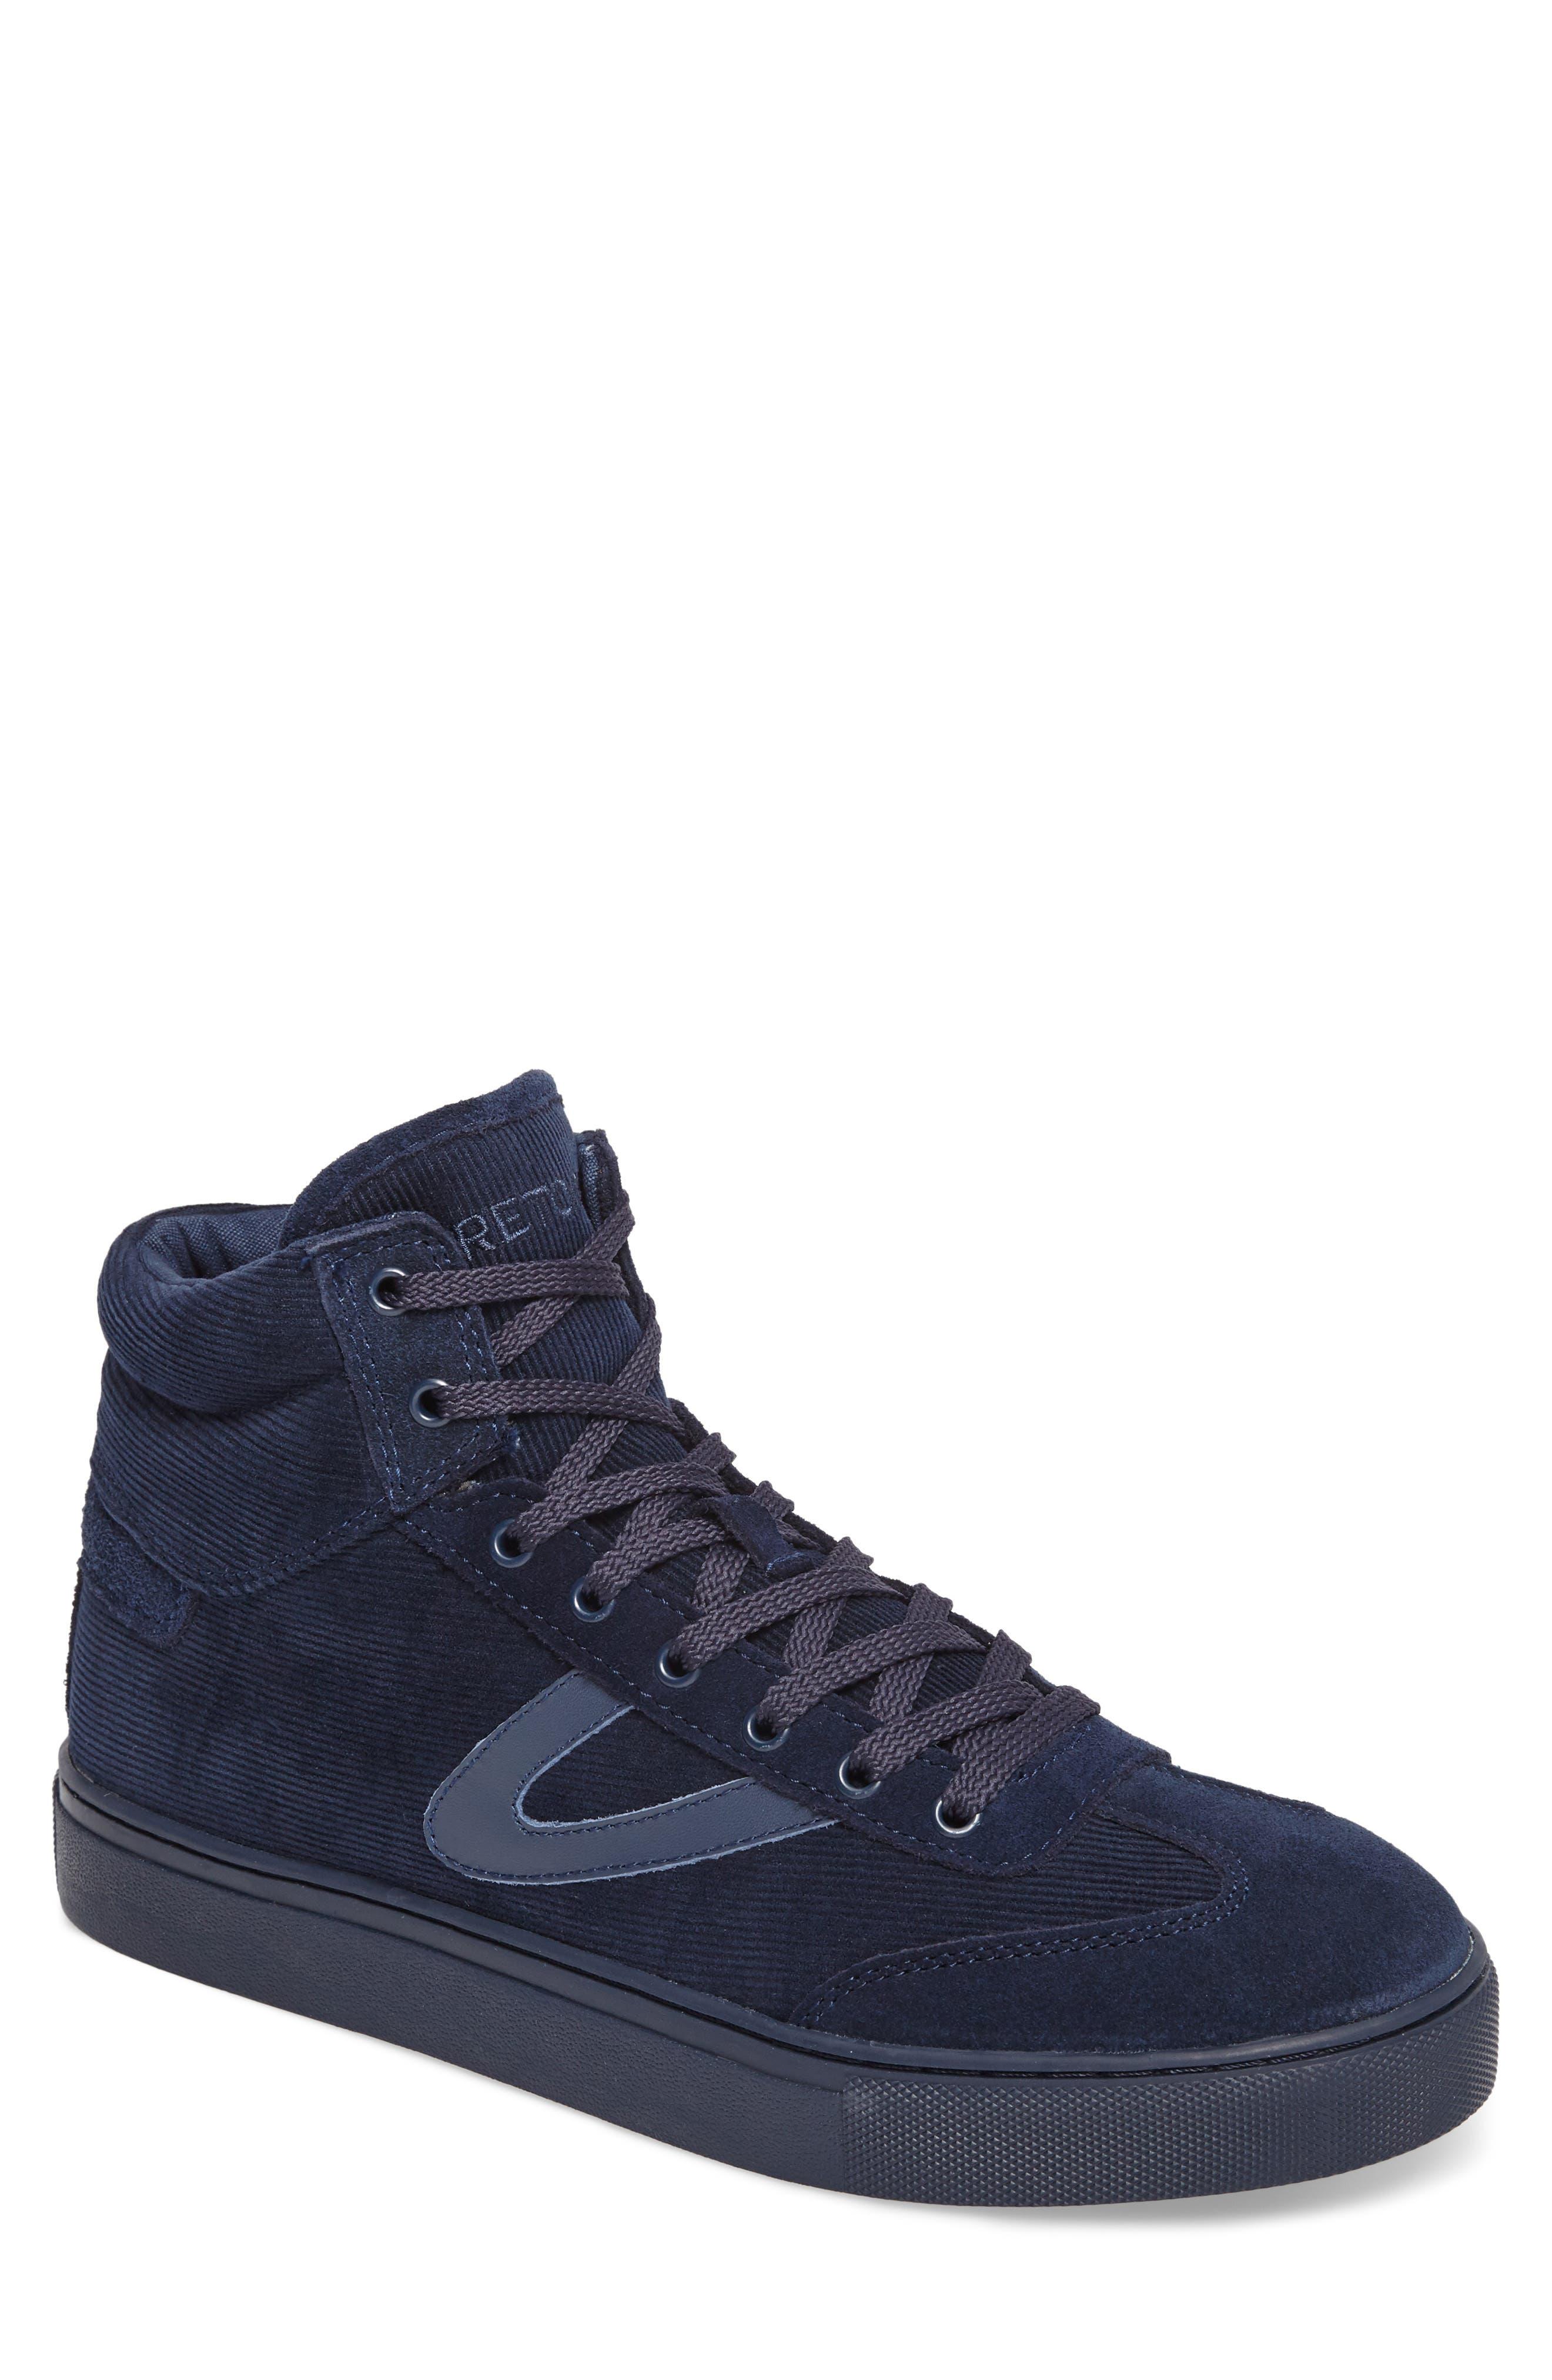 Jack High Top Sneaker,                             Main thumbnail 2, color,